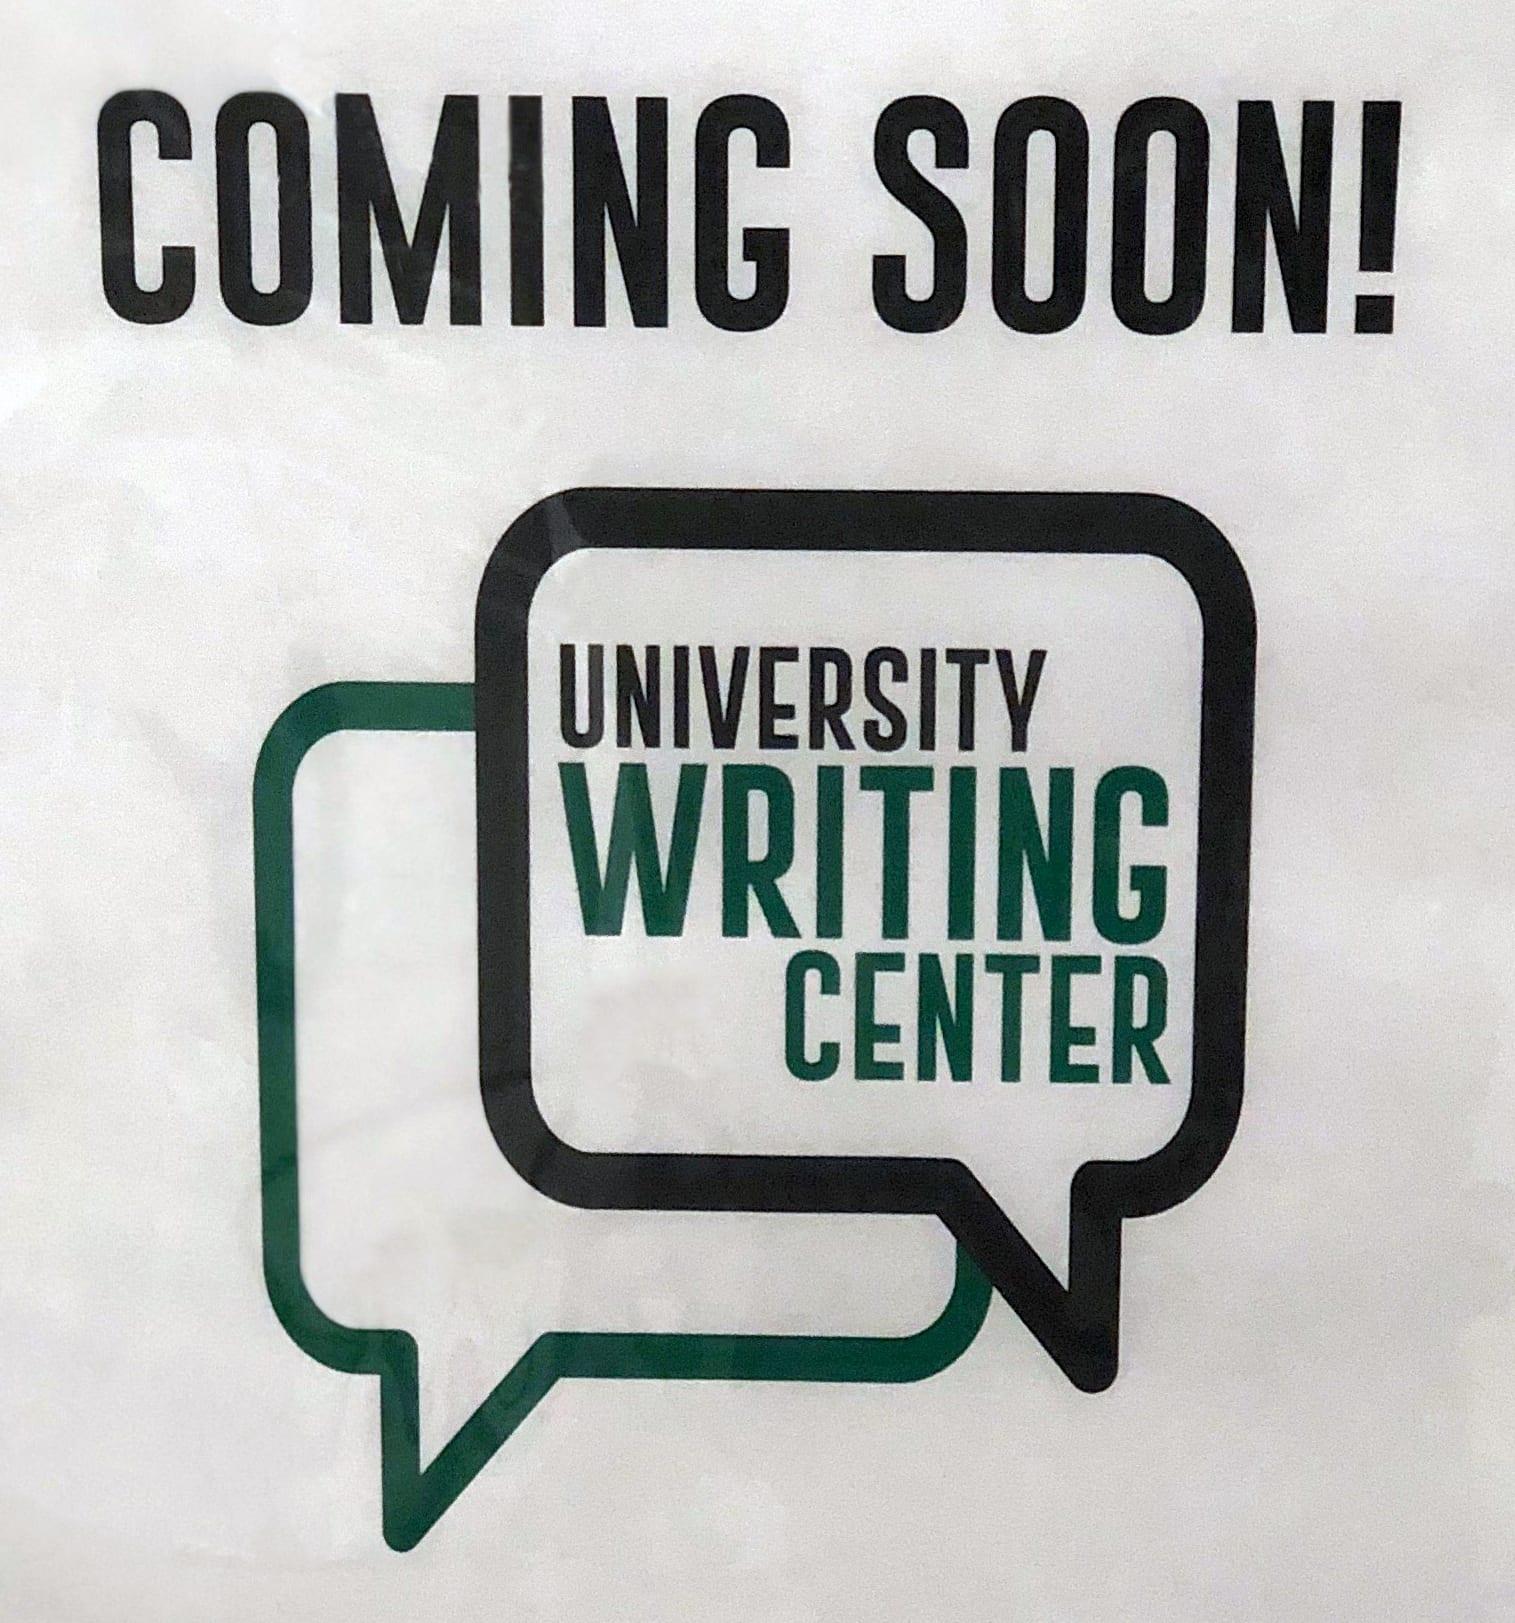 Writing Center Sign